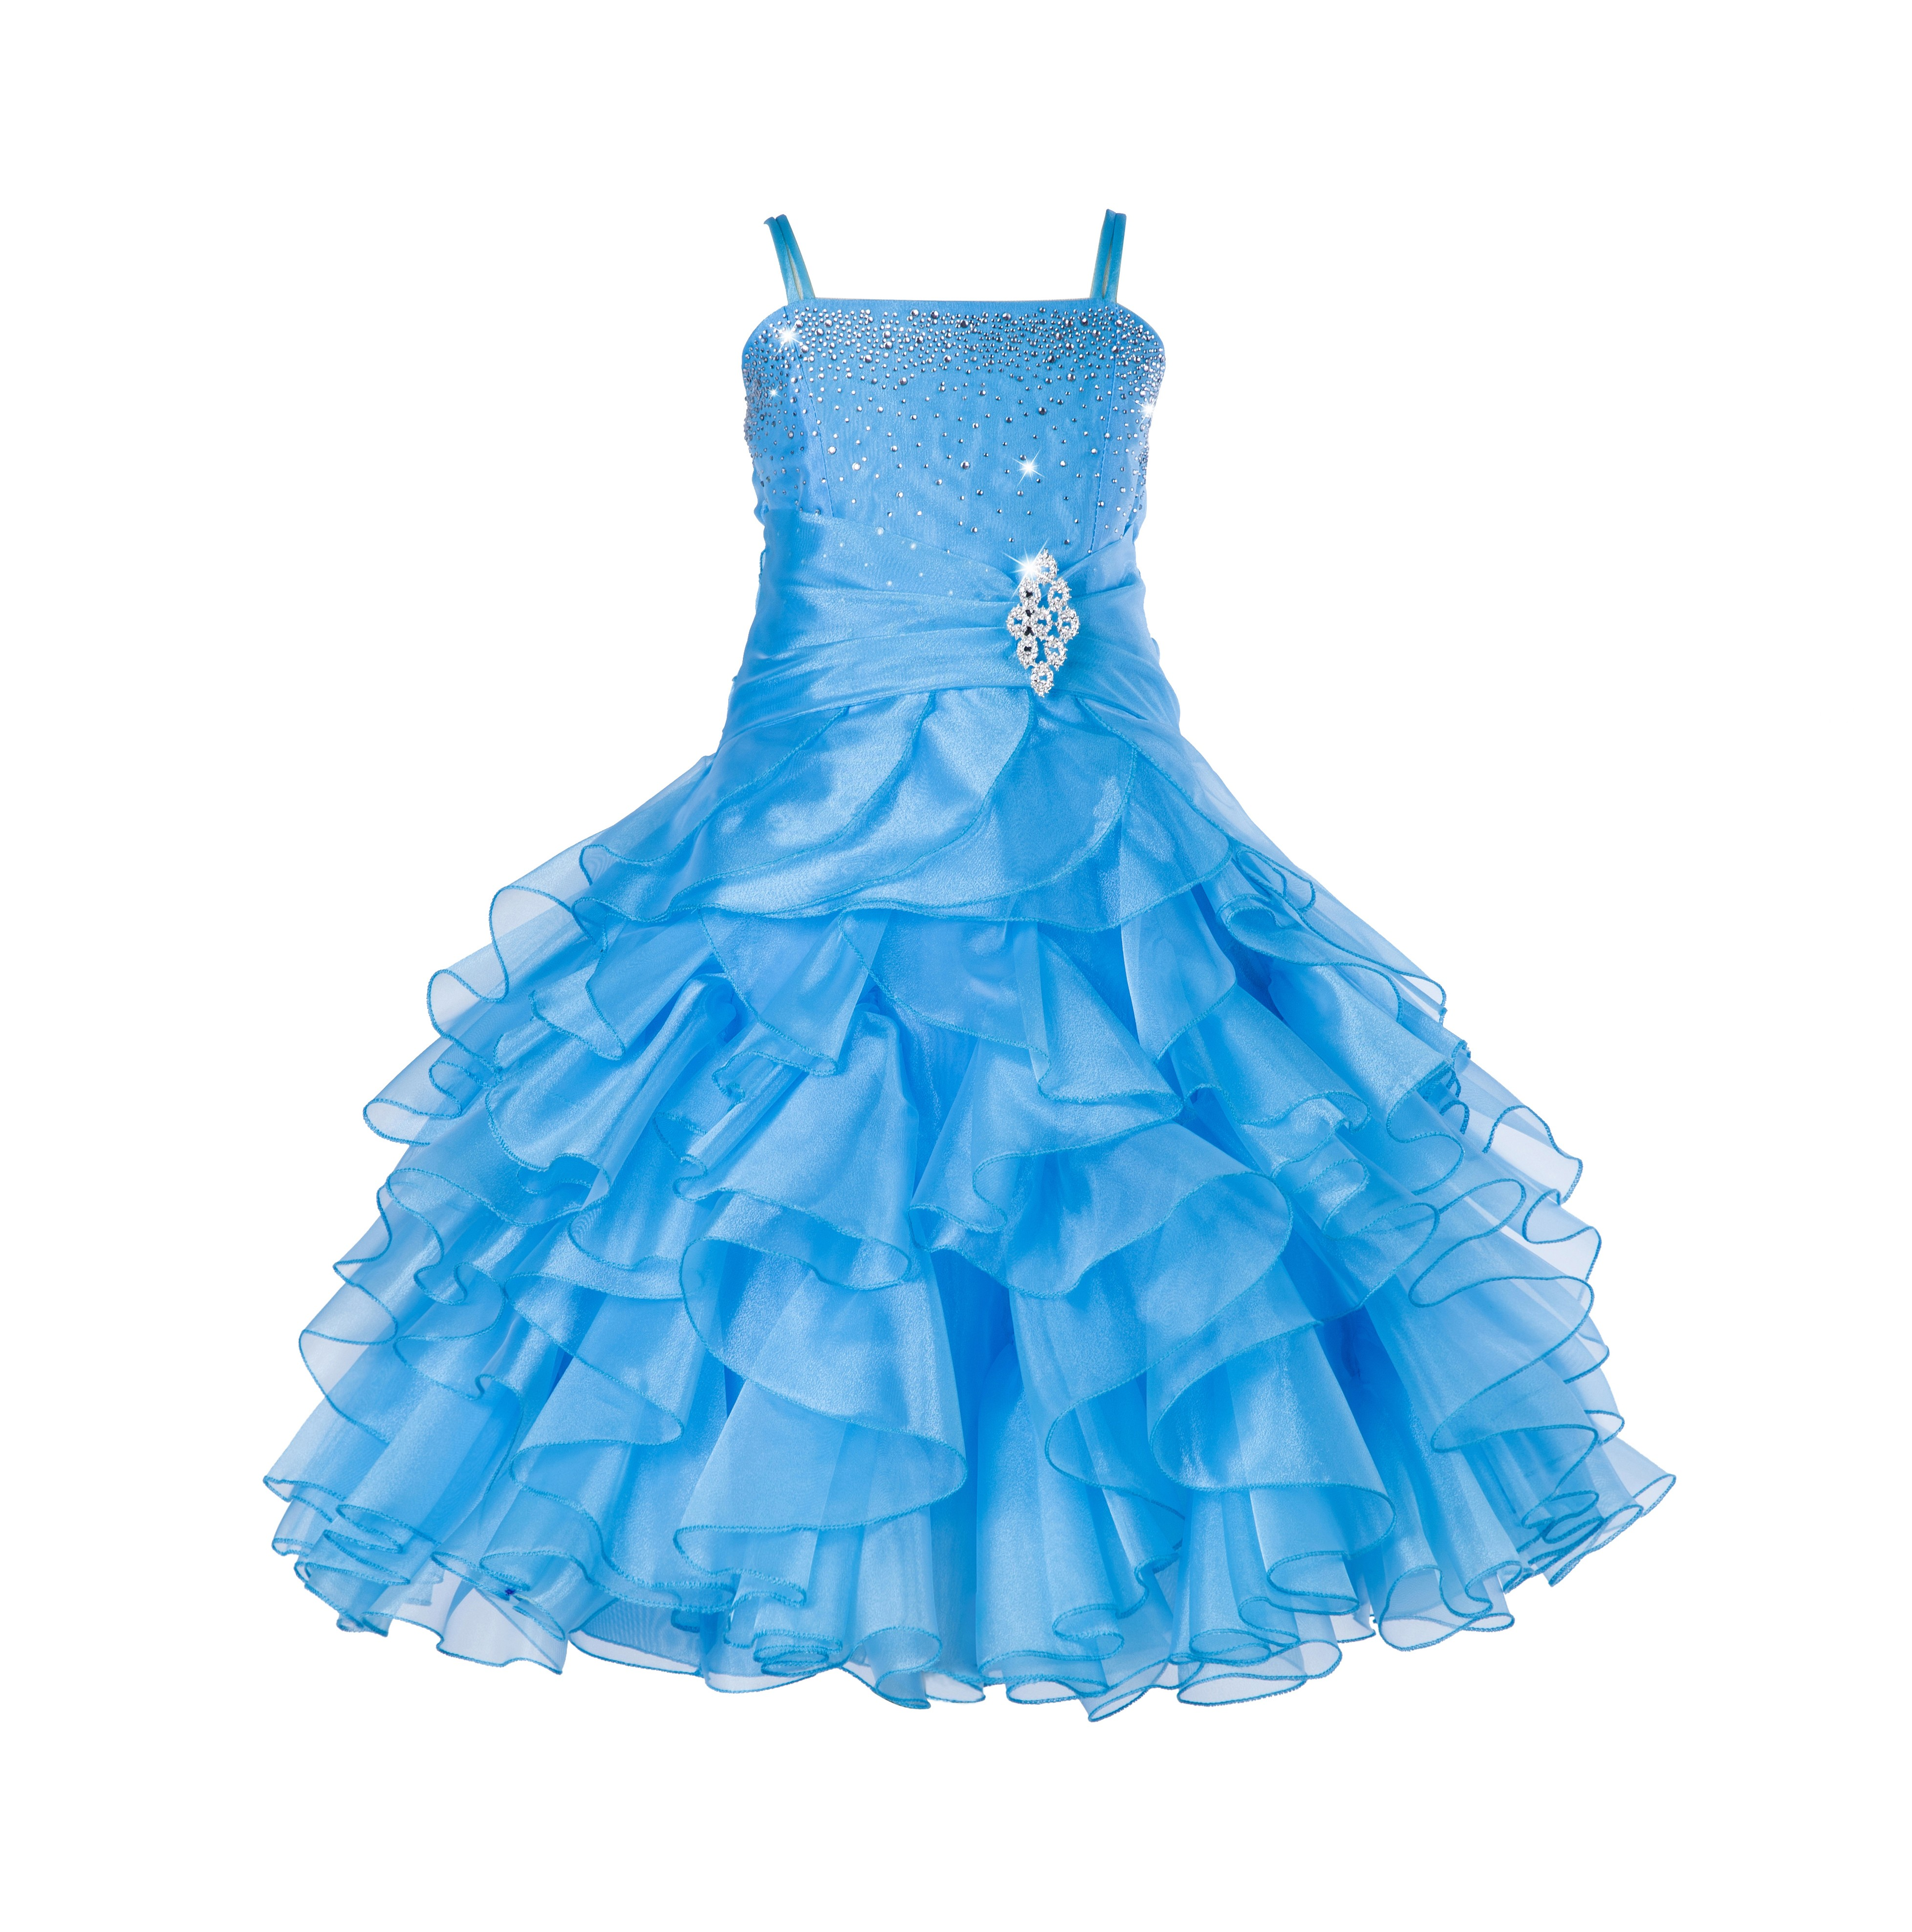 Turquoise Rhinestone Organza Layers Flower Girl Dress Elegant Stunning 164S